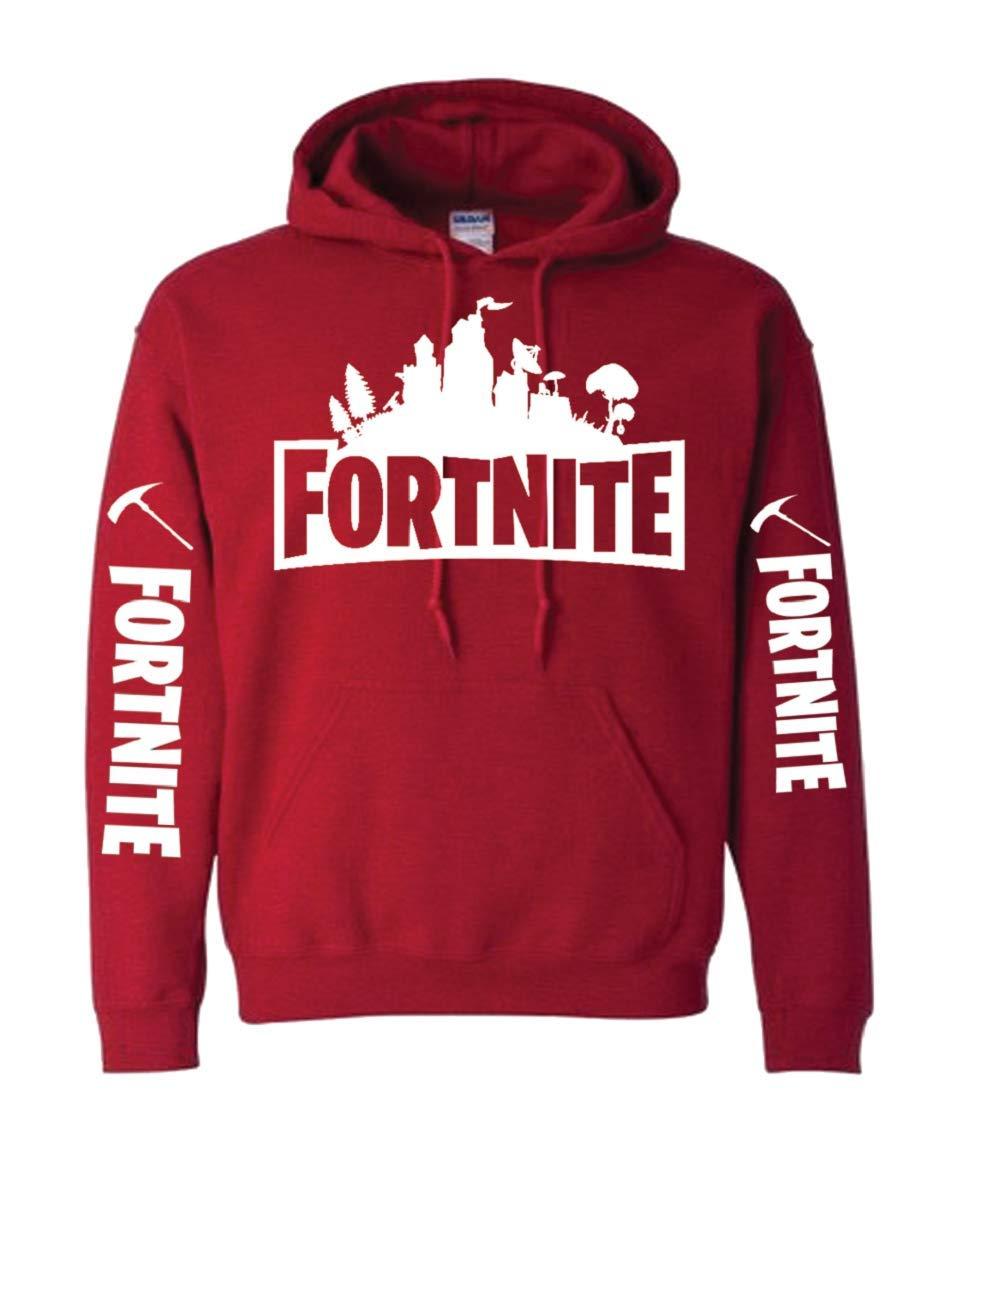 TheTshack Fortnite Hero Hoodie Fortnite Gamer